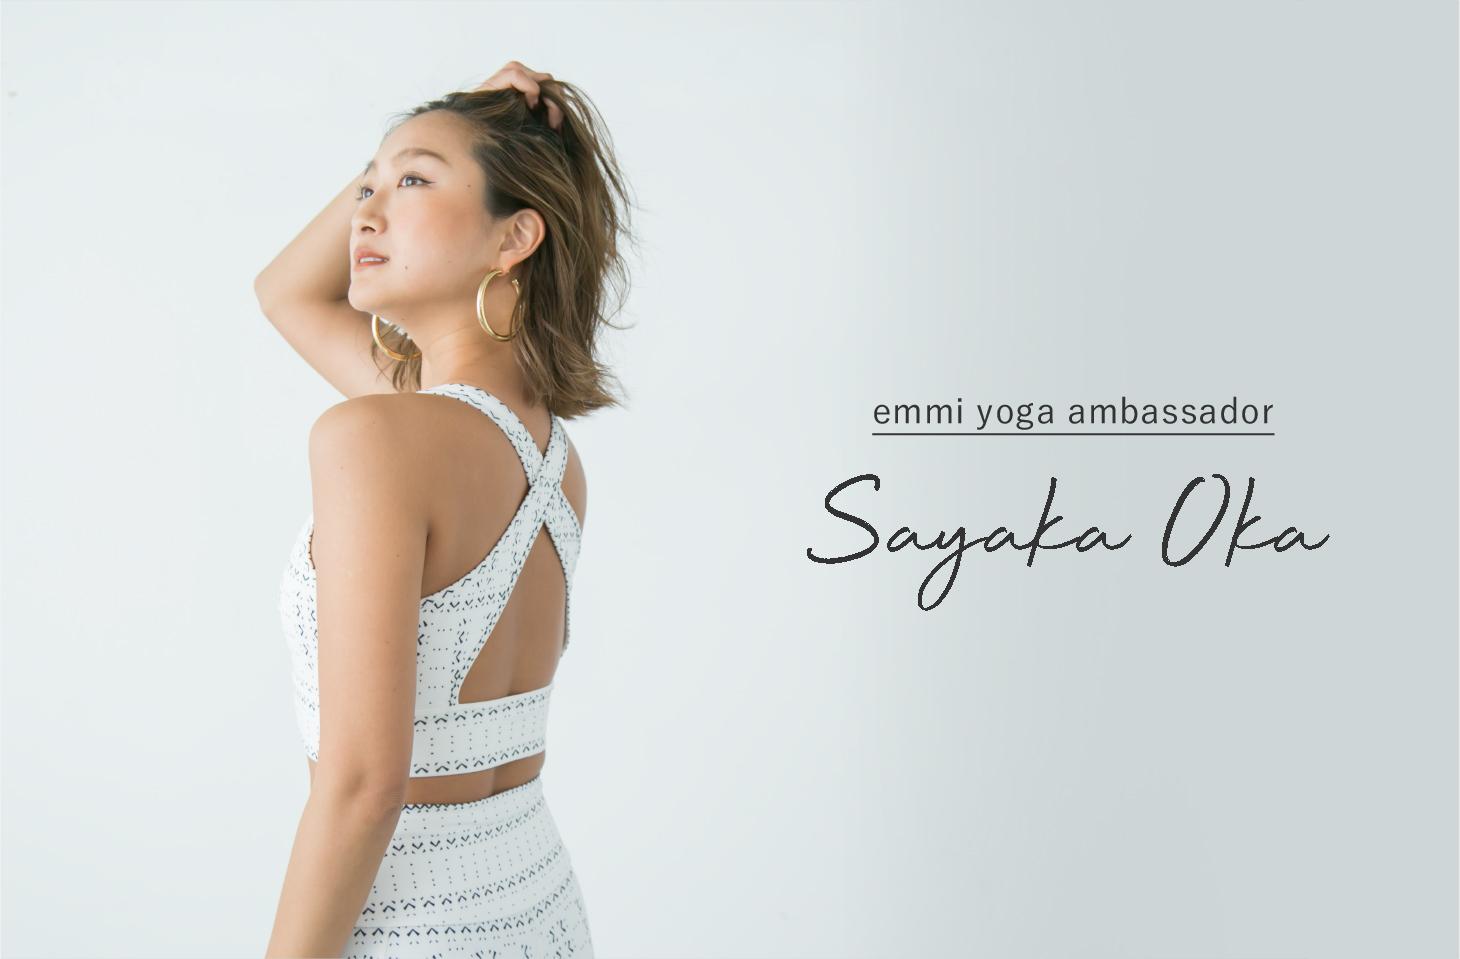 emmi yoga ambassador Sayaka Oka